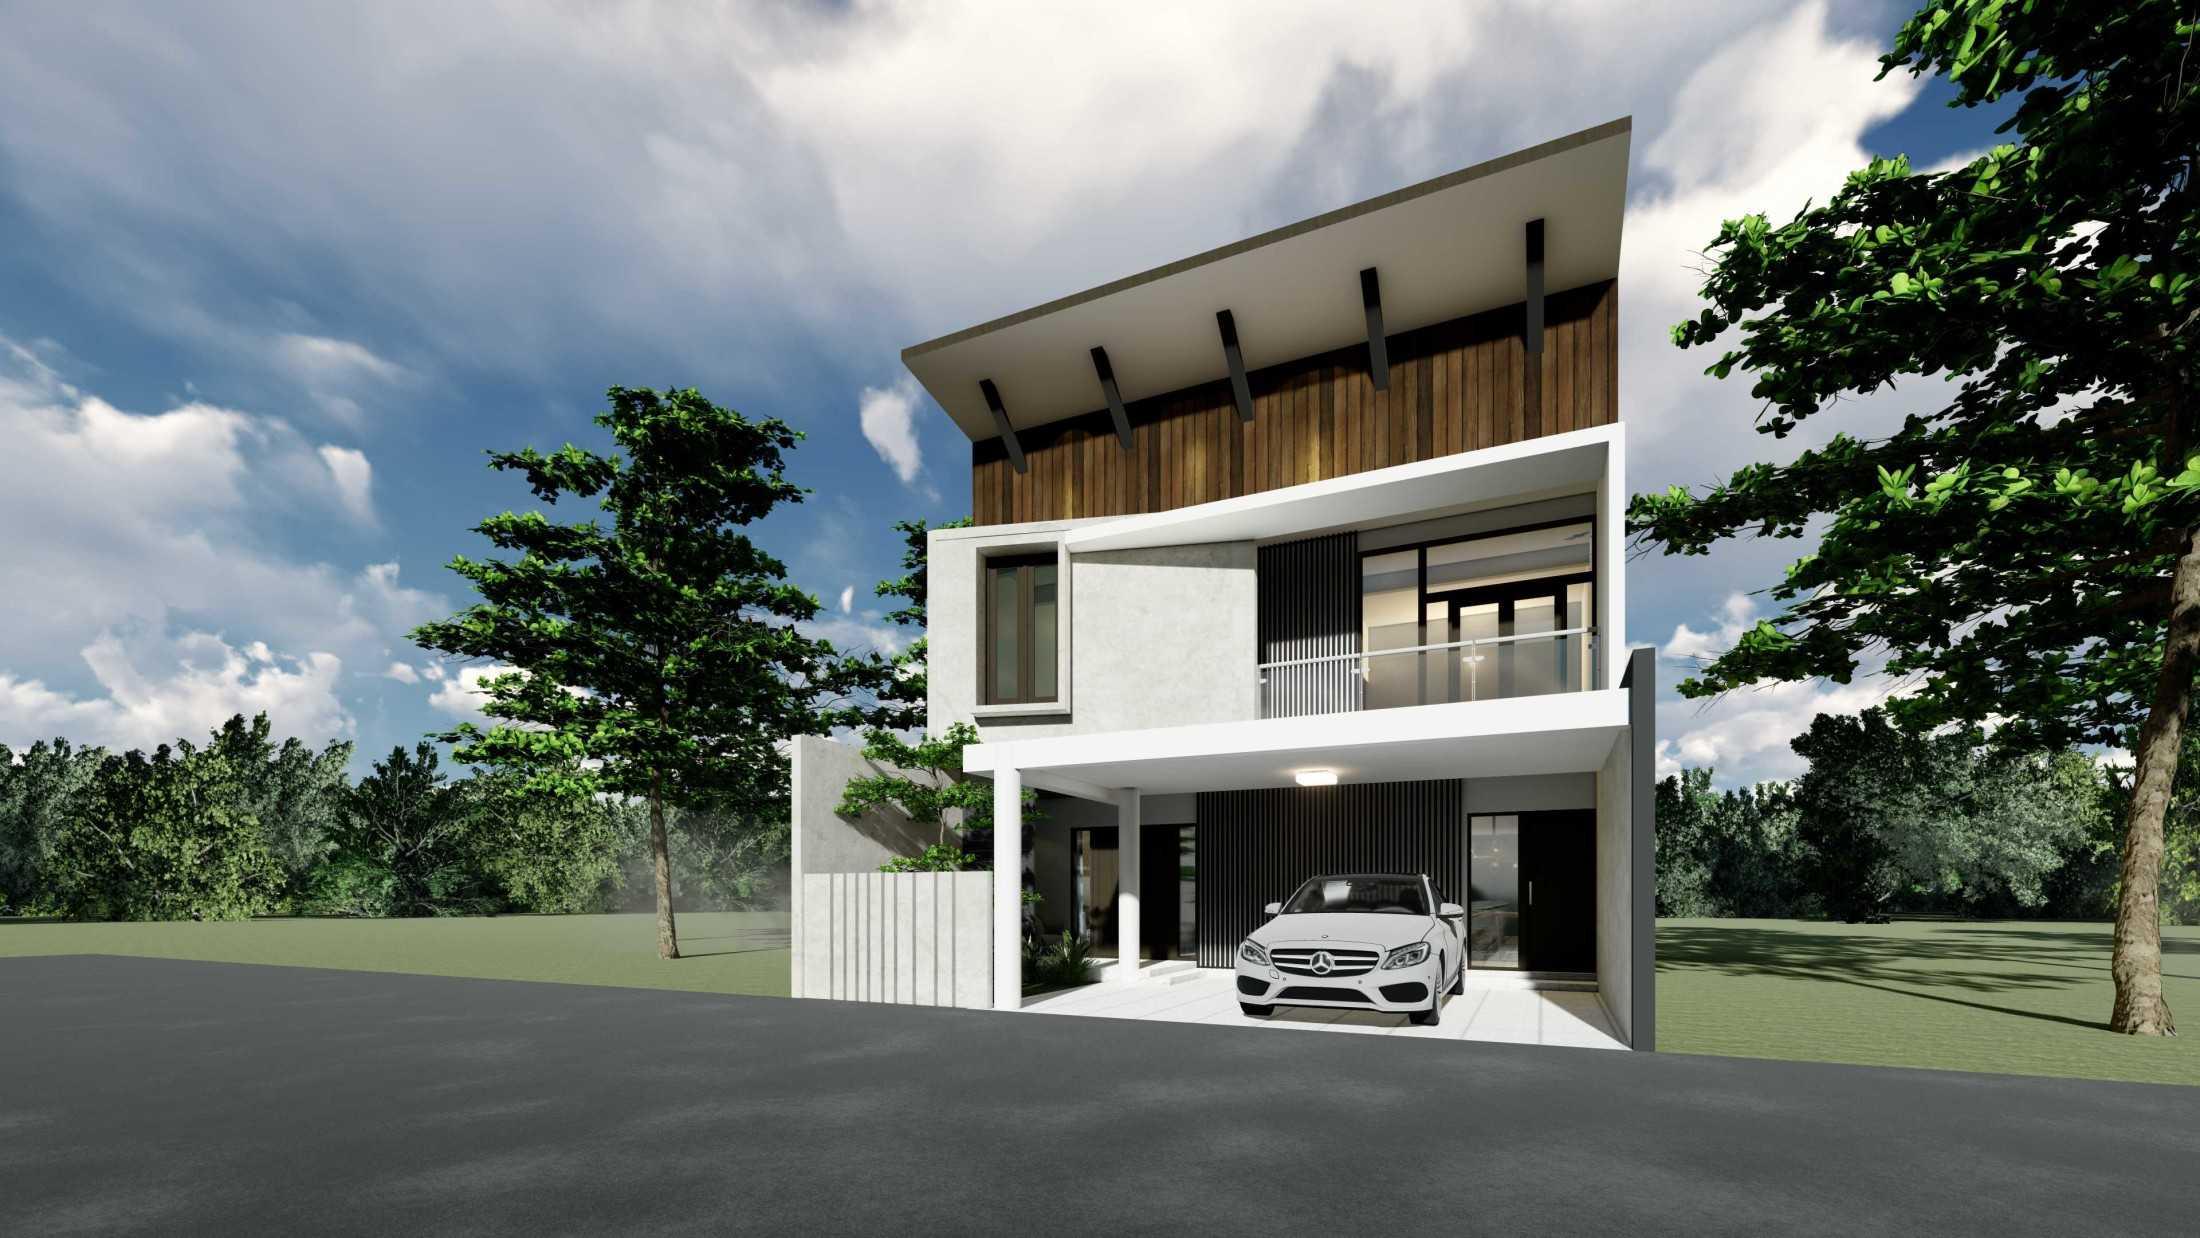 Astabumi Studio Rb House Bandung Bandung, Kota Bandung, Jawa Barat, Indonesia Klaten, Kabupaten Klaten, Jawa Tengah, Indonesia Cv-Astabumi-Manunggal-Prakarsa-Prambanan-Reading-Room  119323